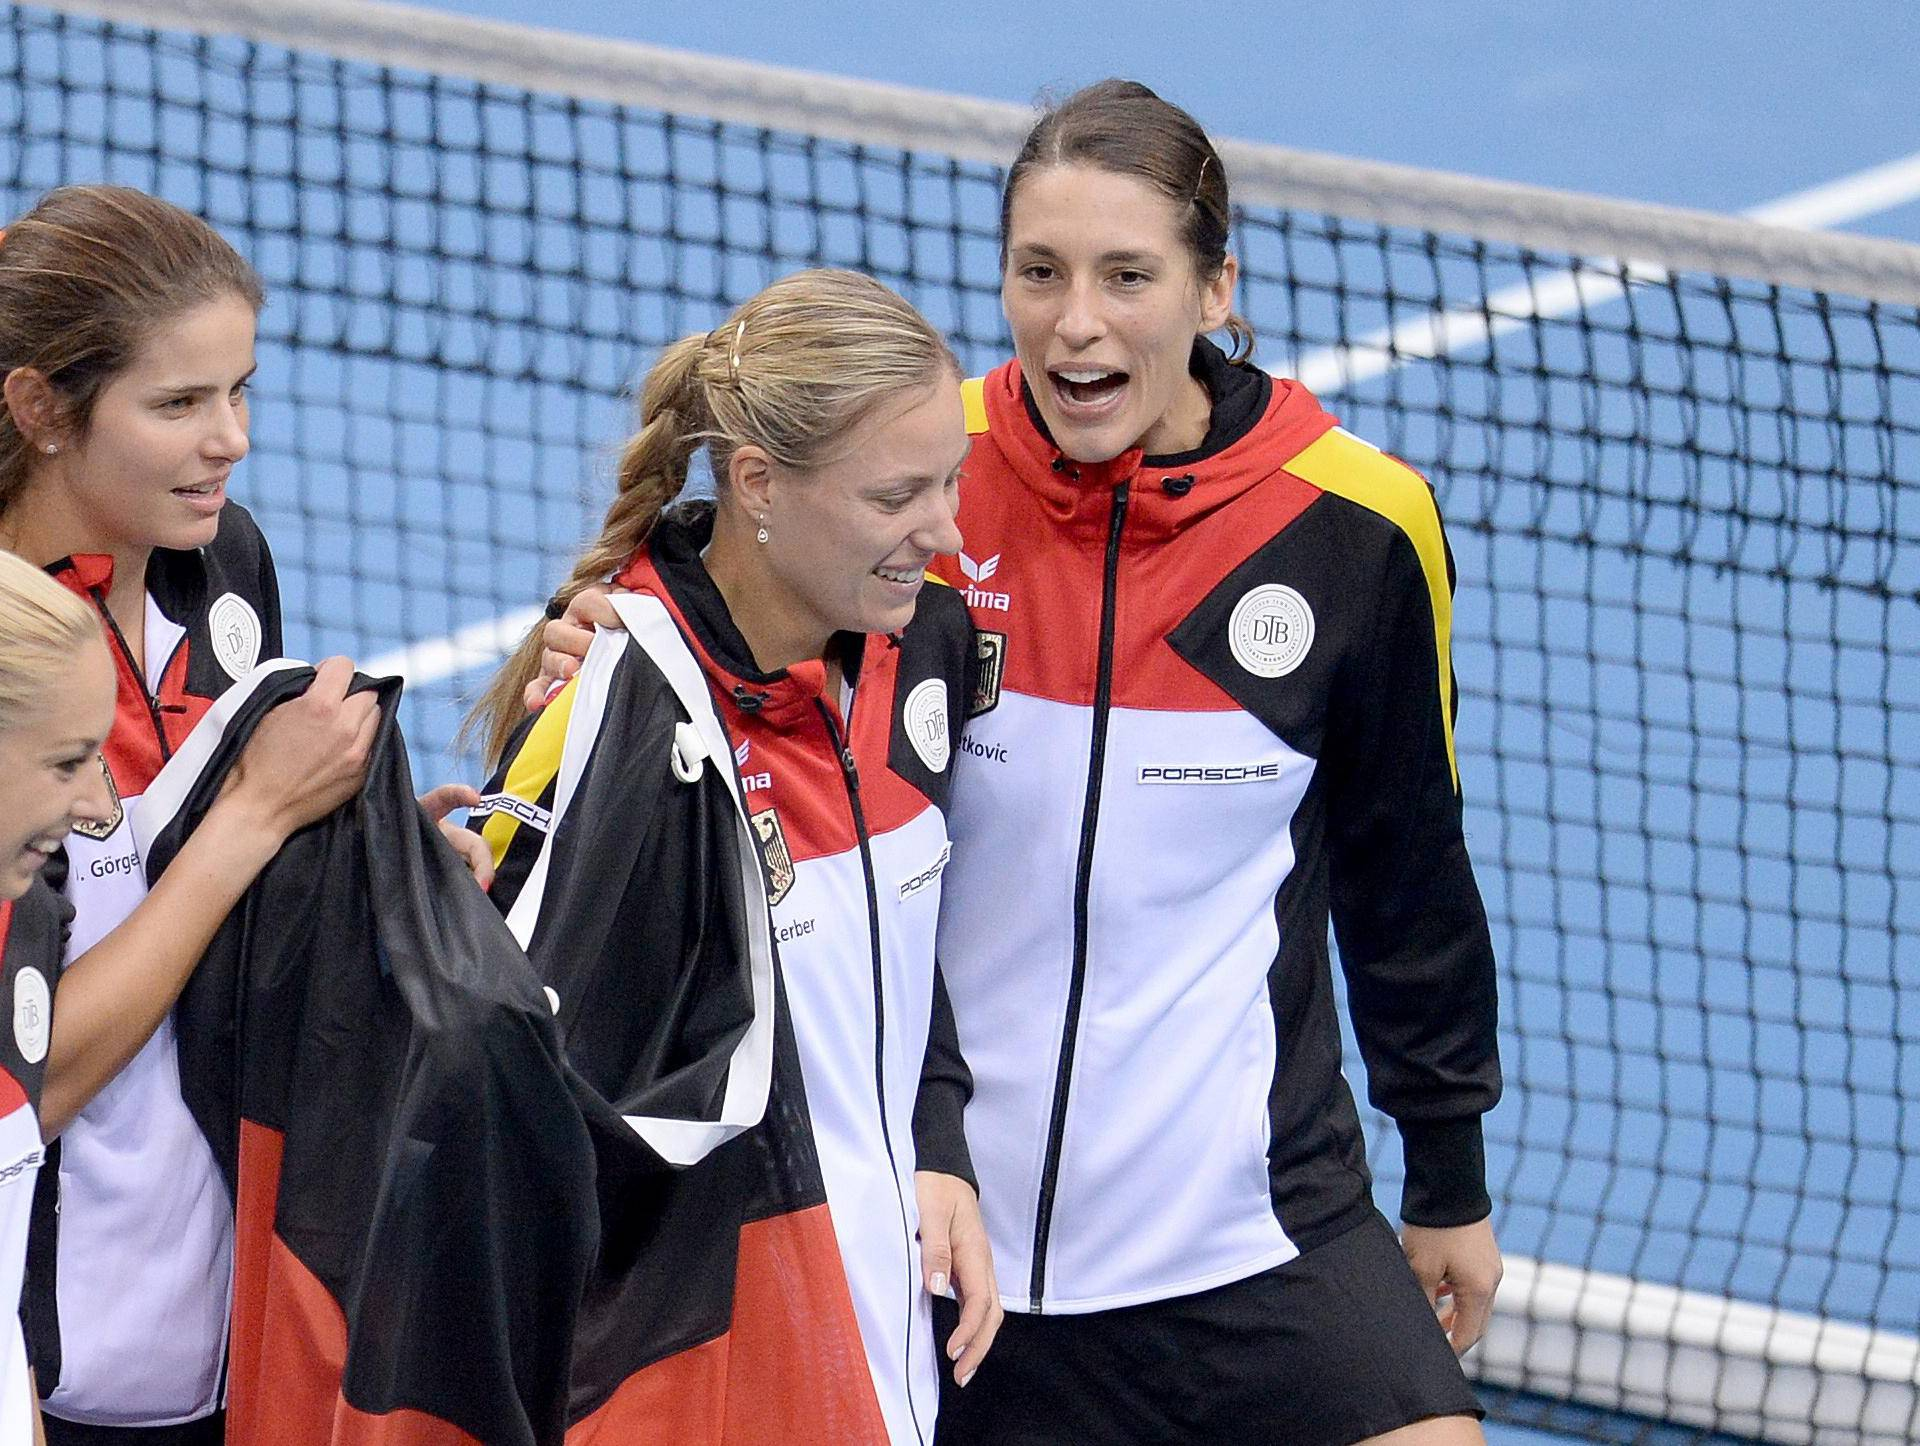 Tennis Fed Cup: Germany vs. Australia